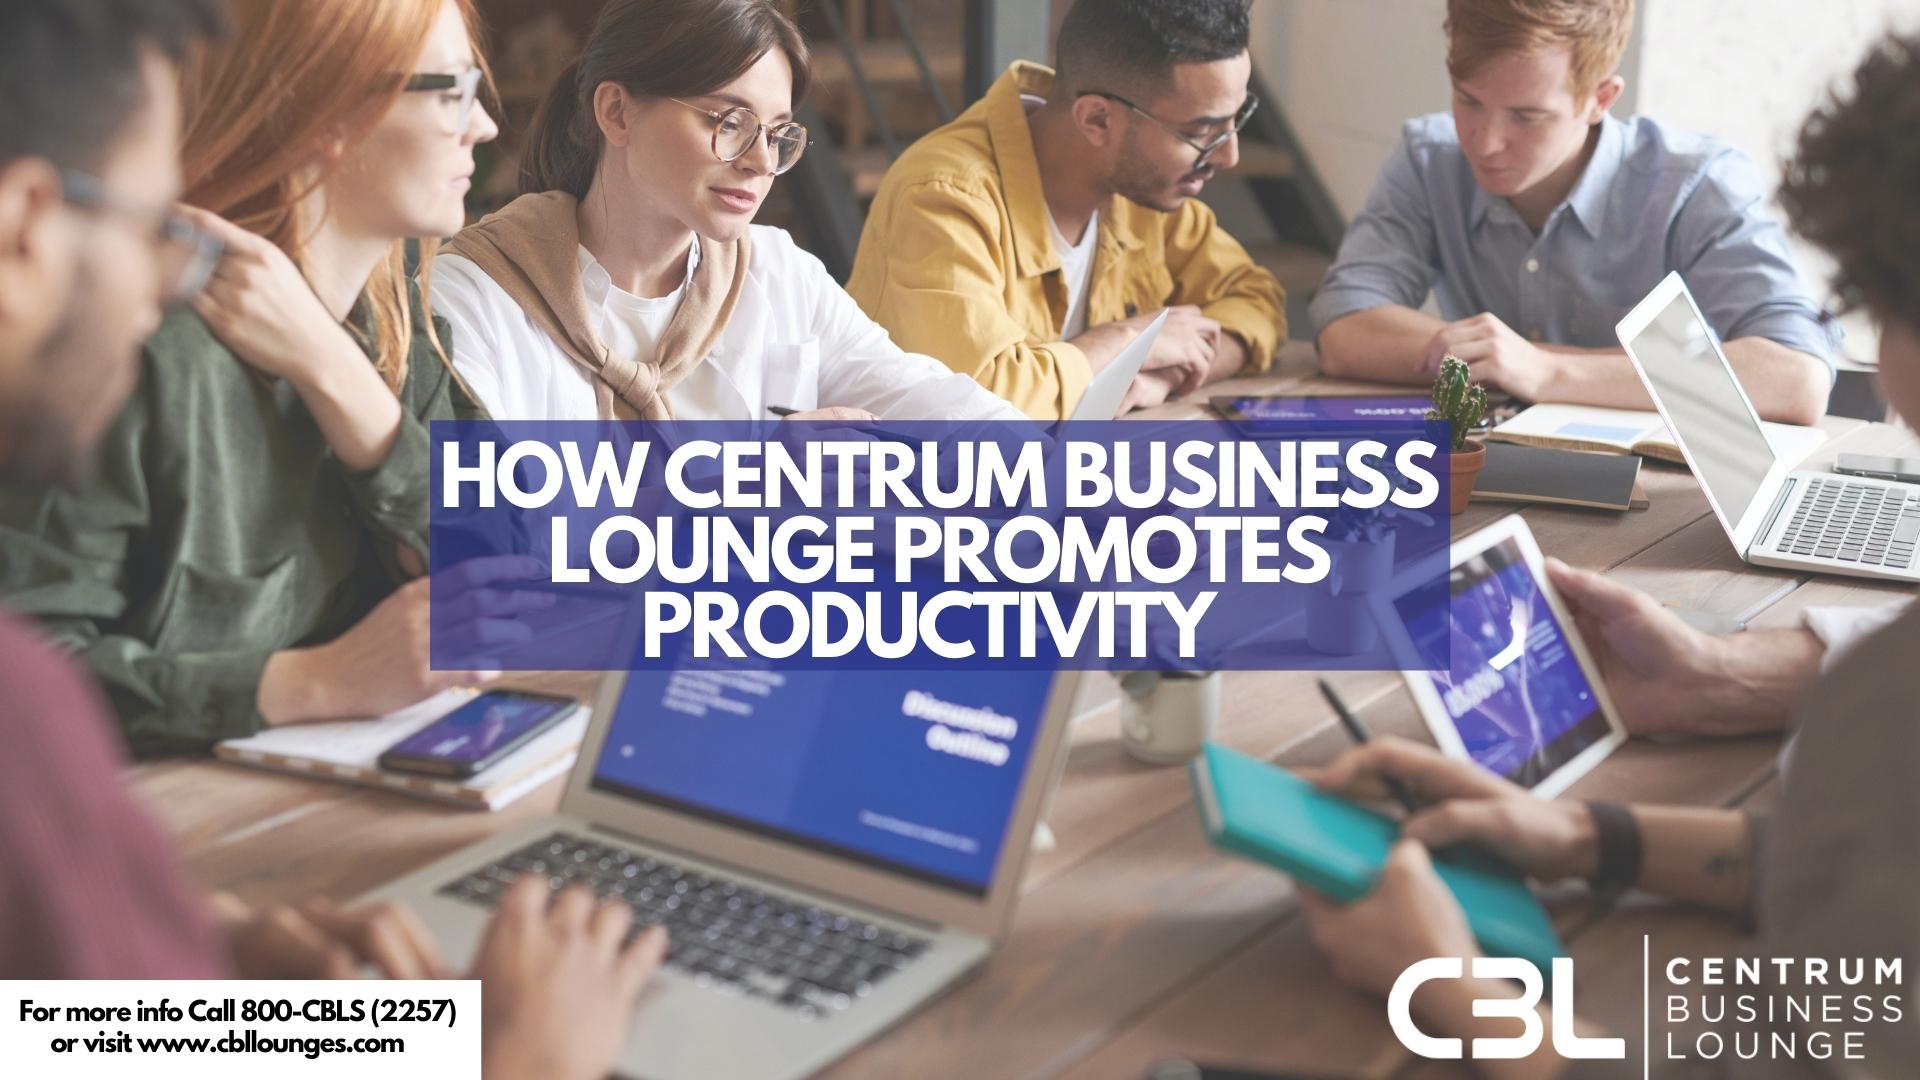 Business Centre in Dubai promoting productivity